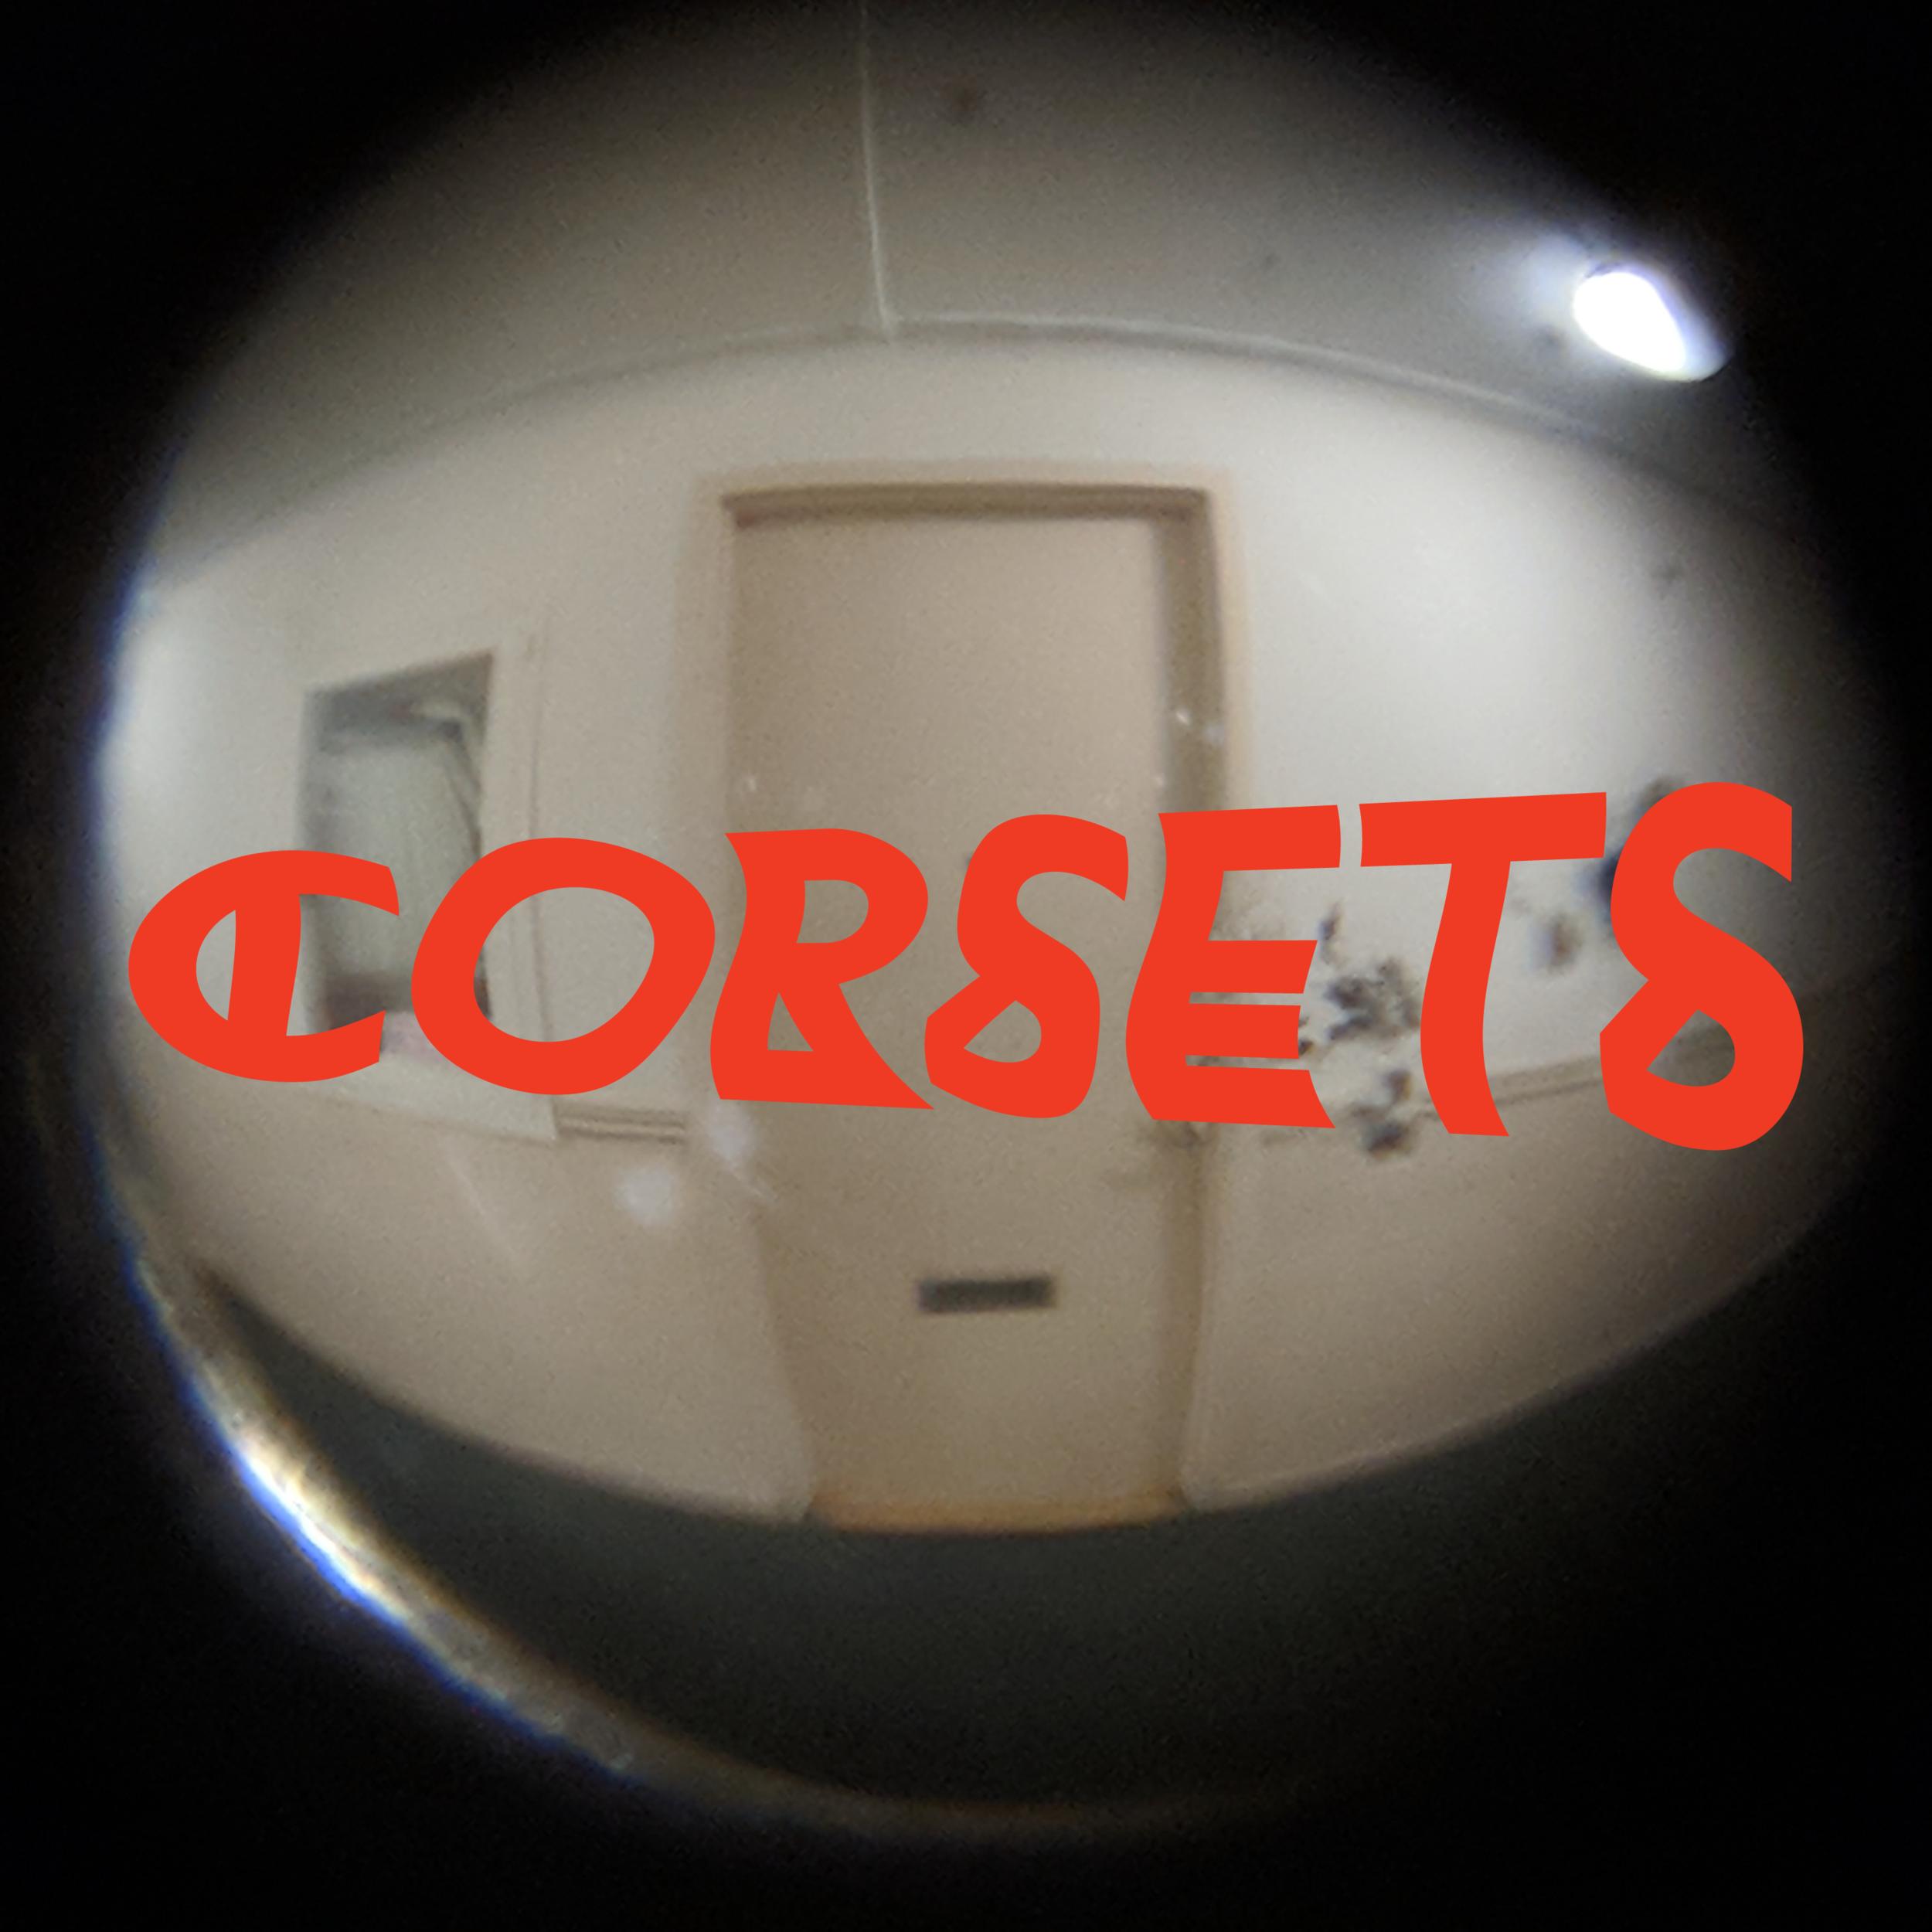 tesrAsset 3Corsets.png